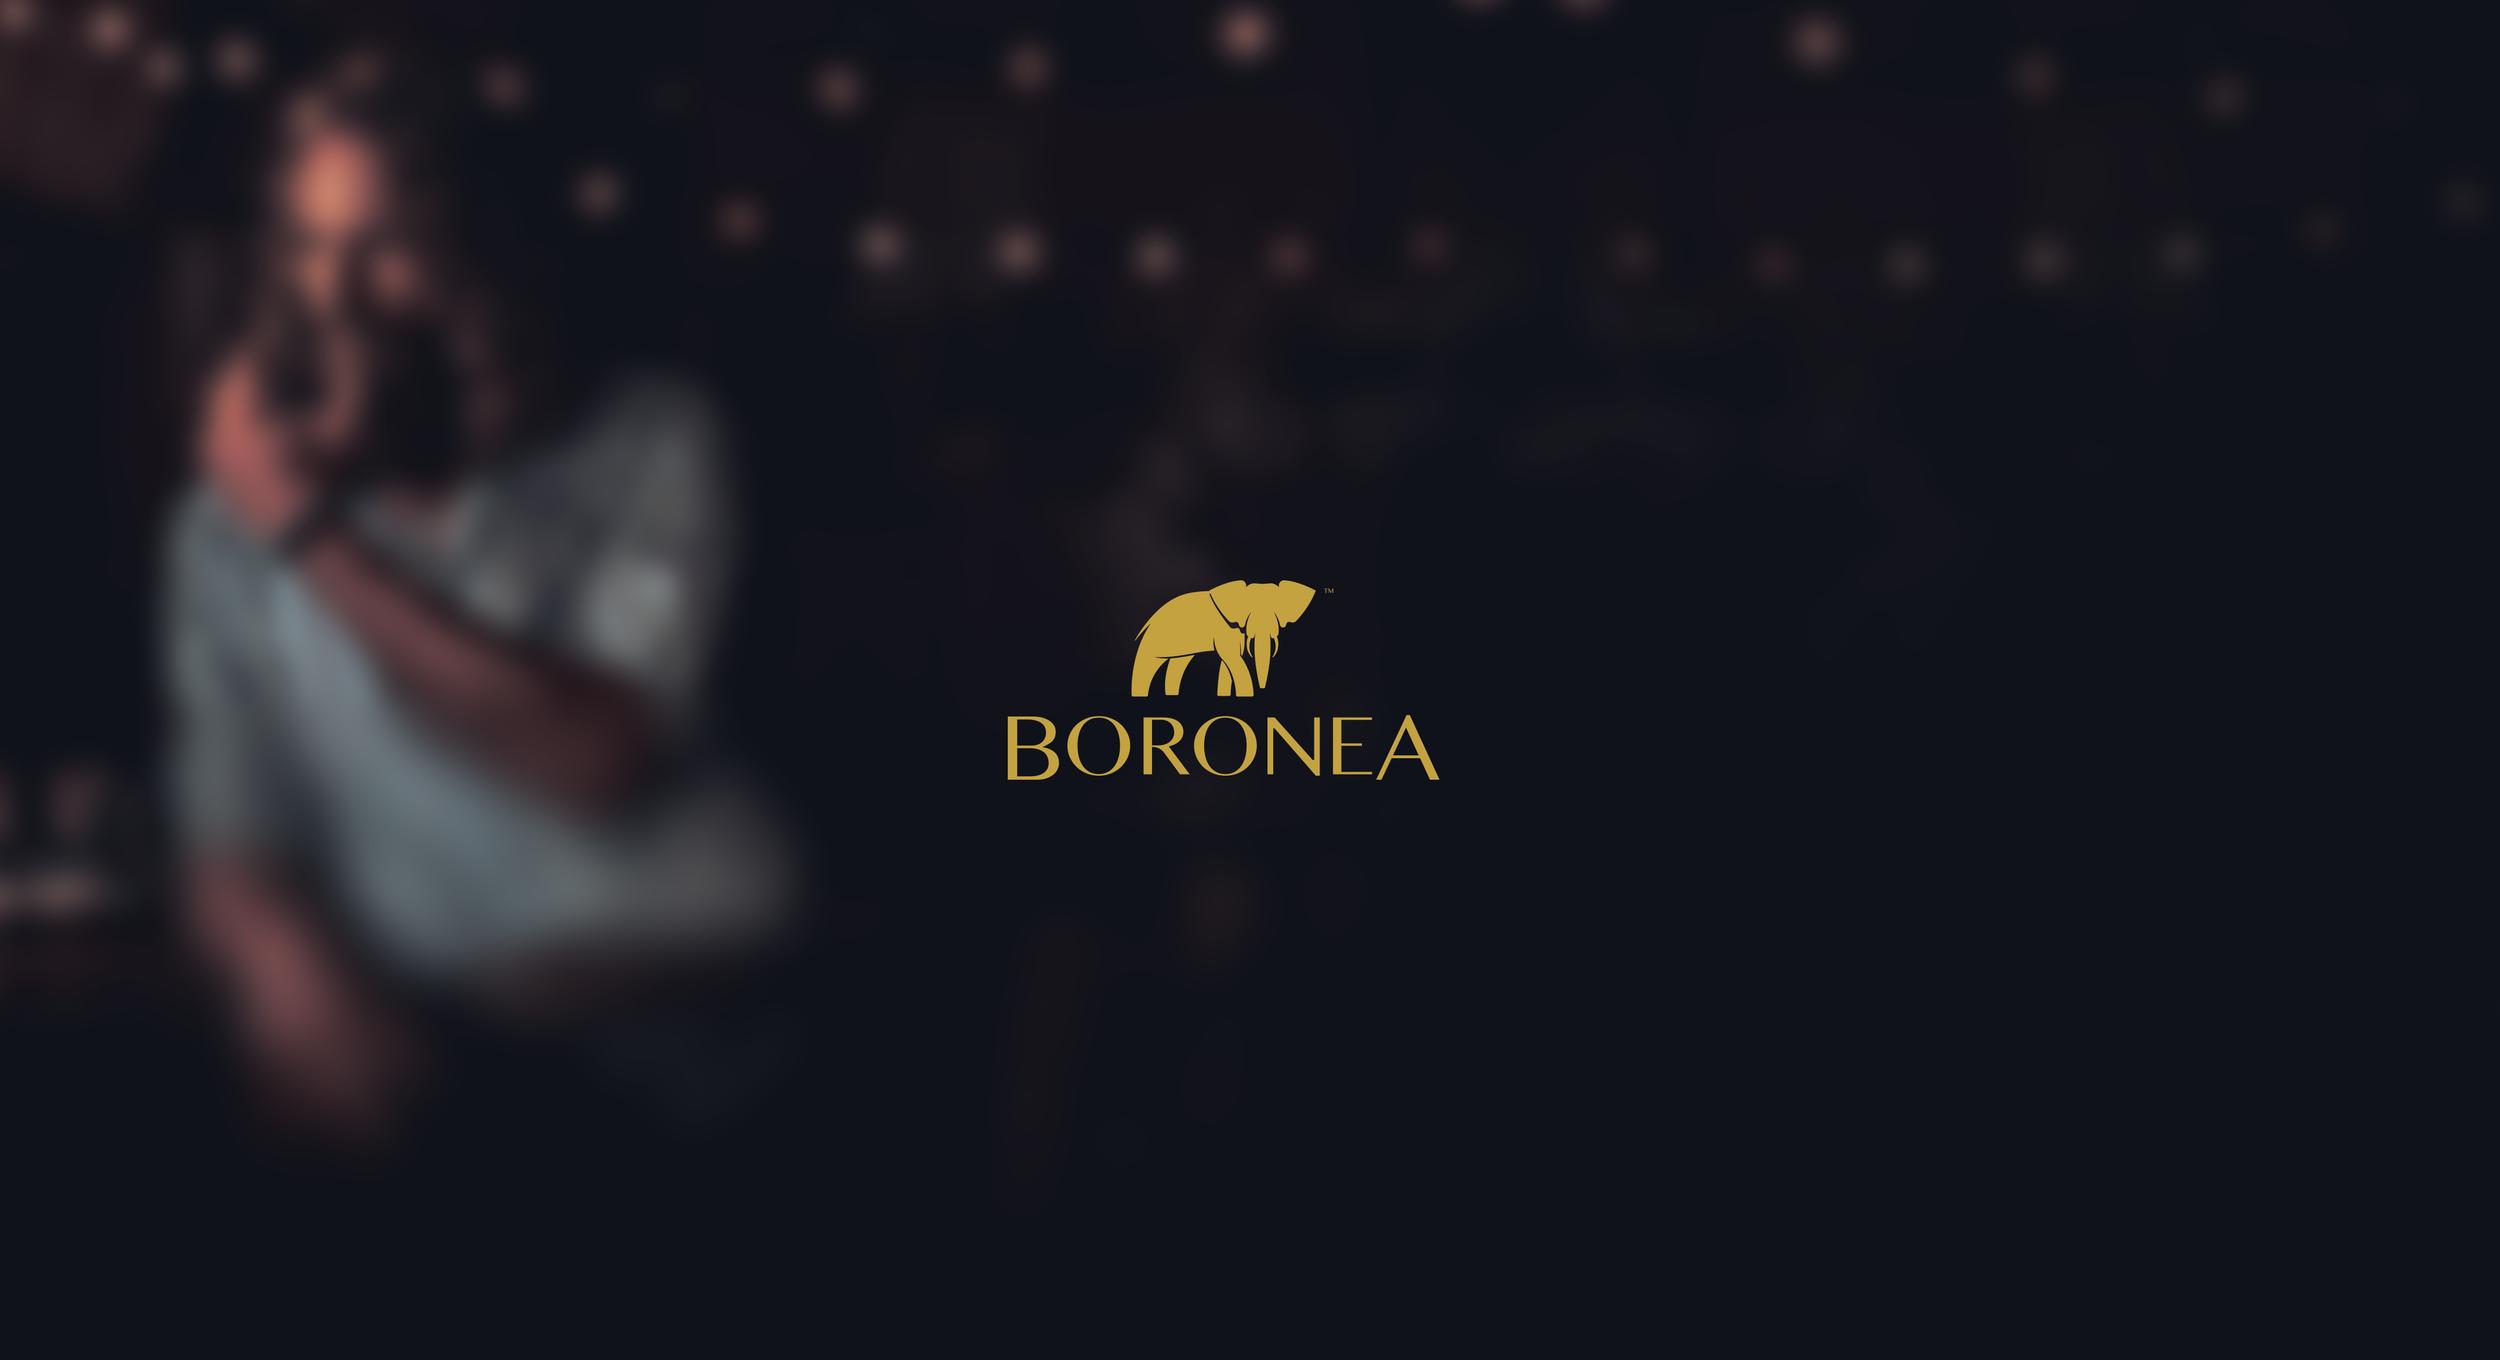 boronea.png